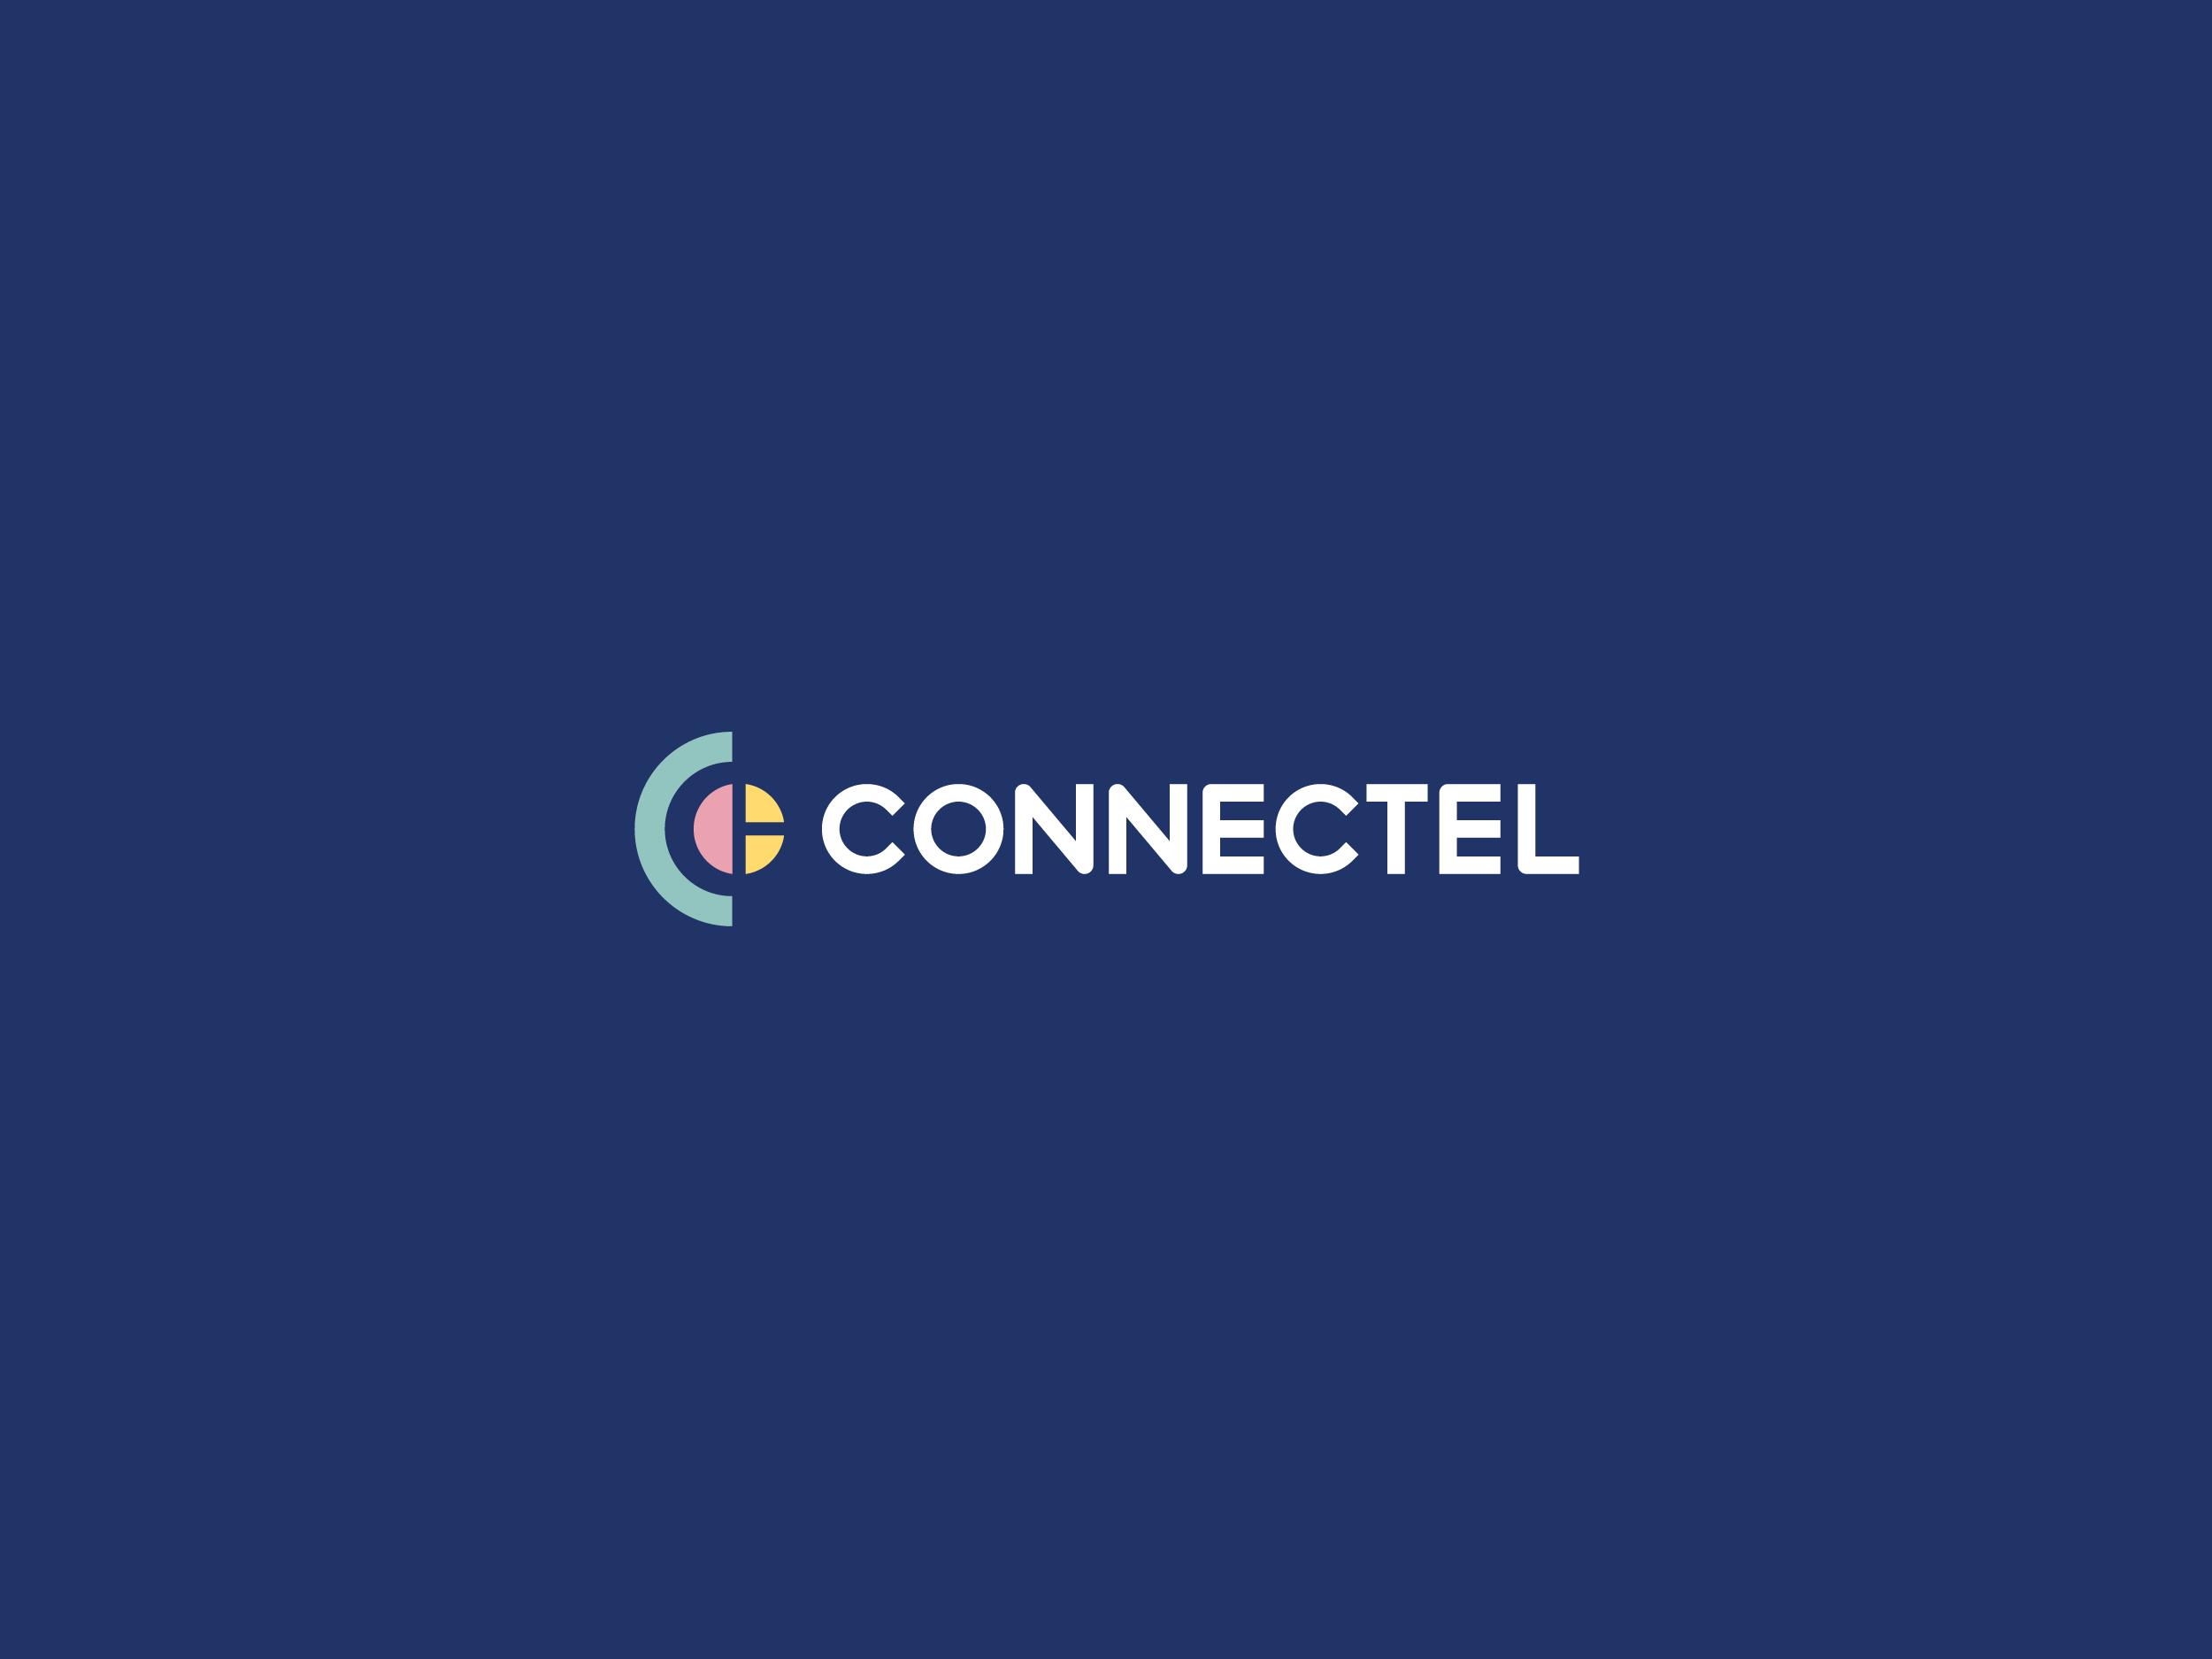 Connectel_Case12.jpg